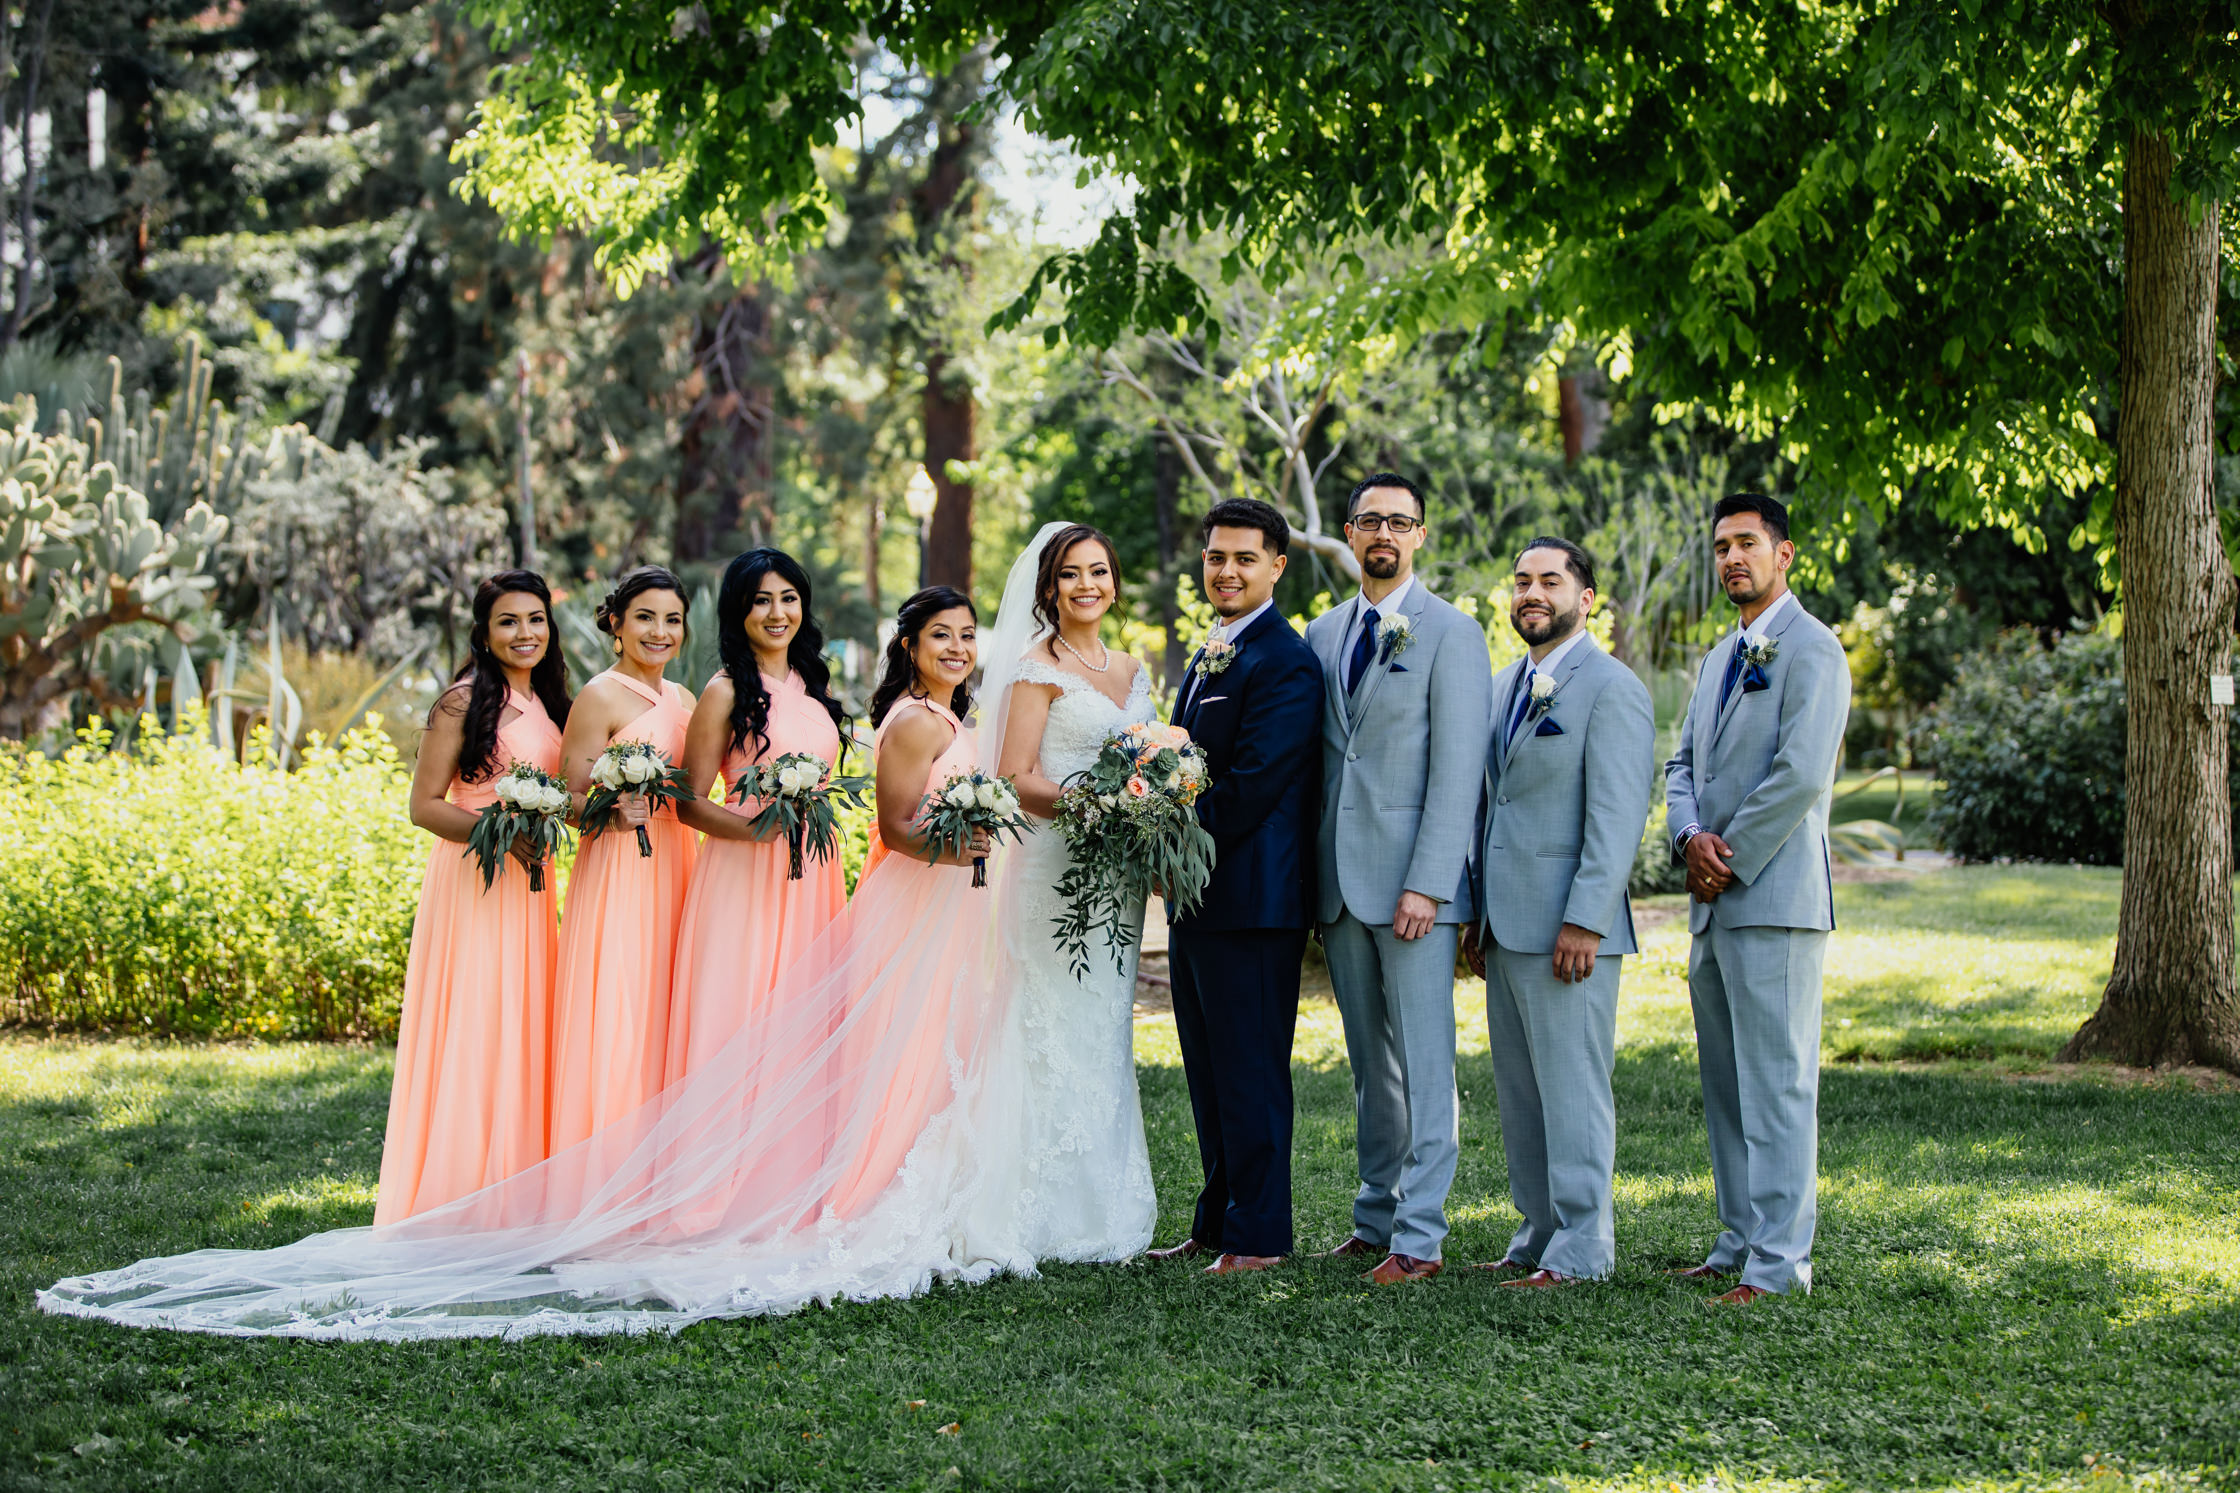 luis_joanna_wedding-46.jpg